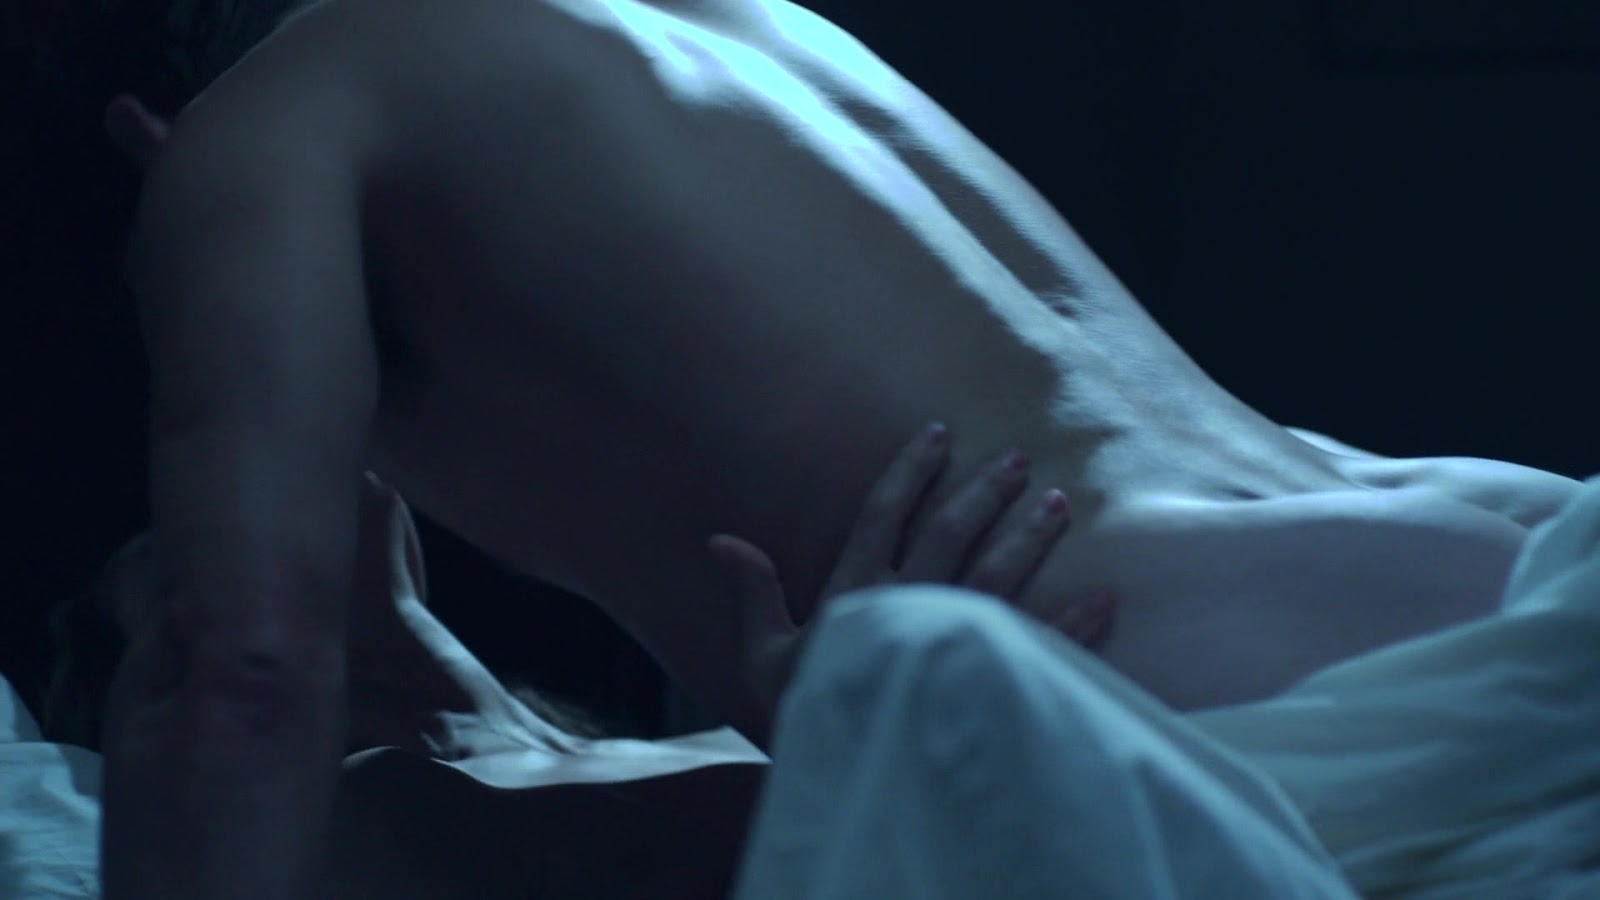 Kit harington nude and sexy photos